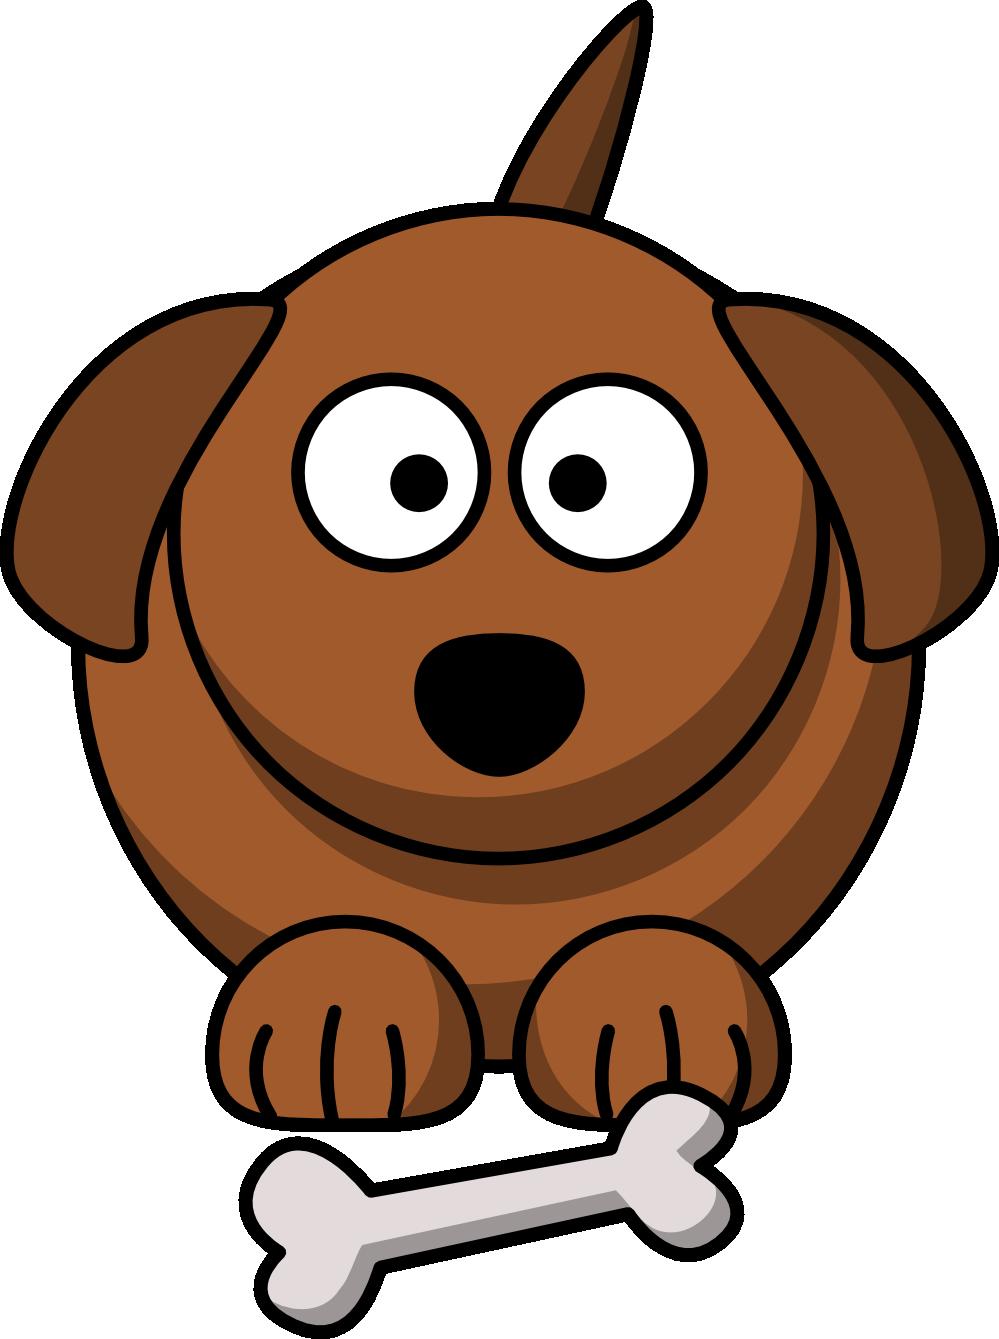 dog free clip art animation - photo #43